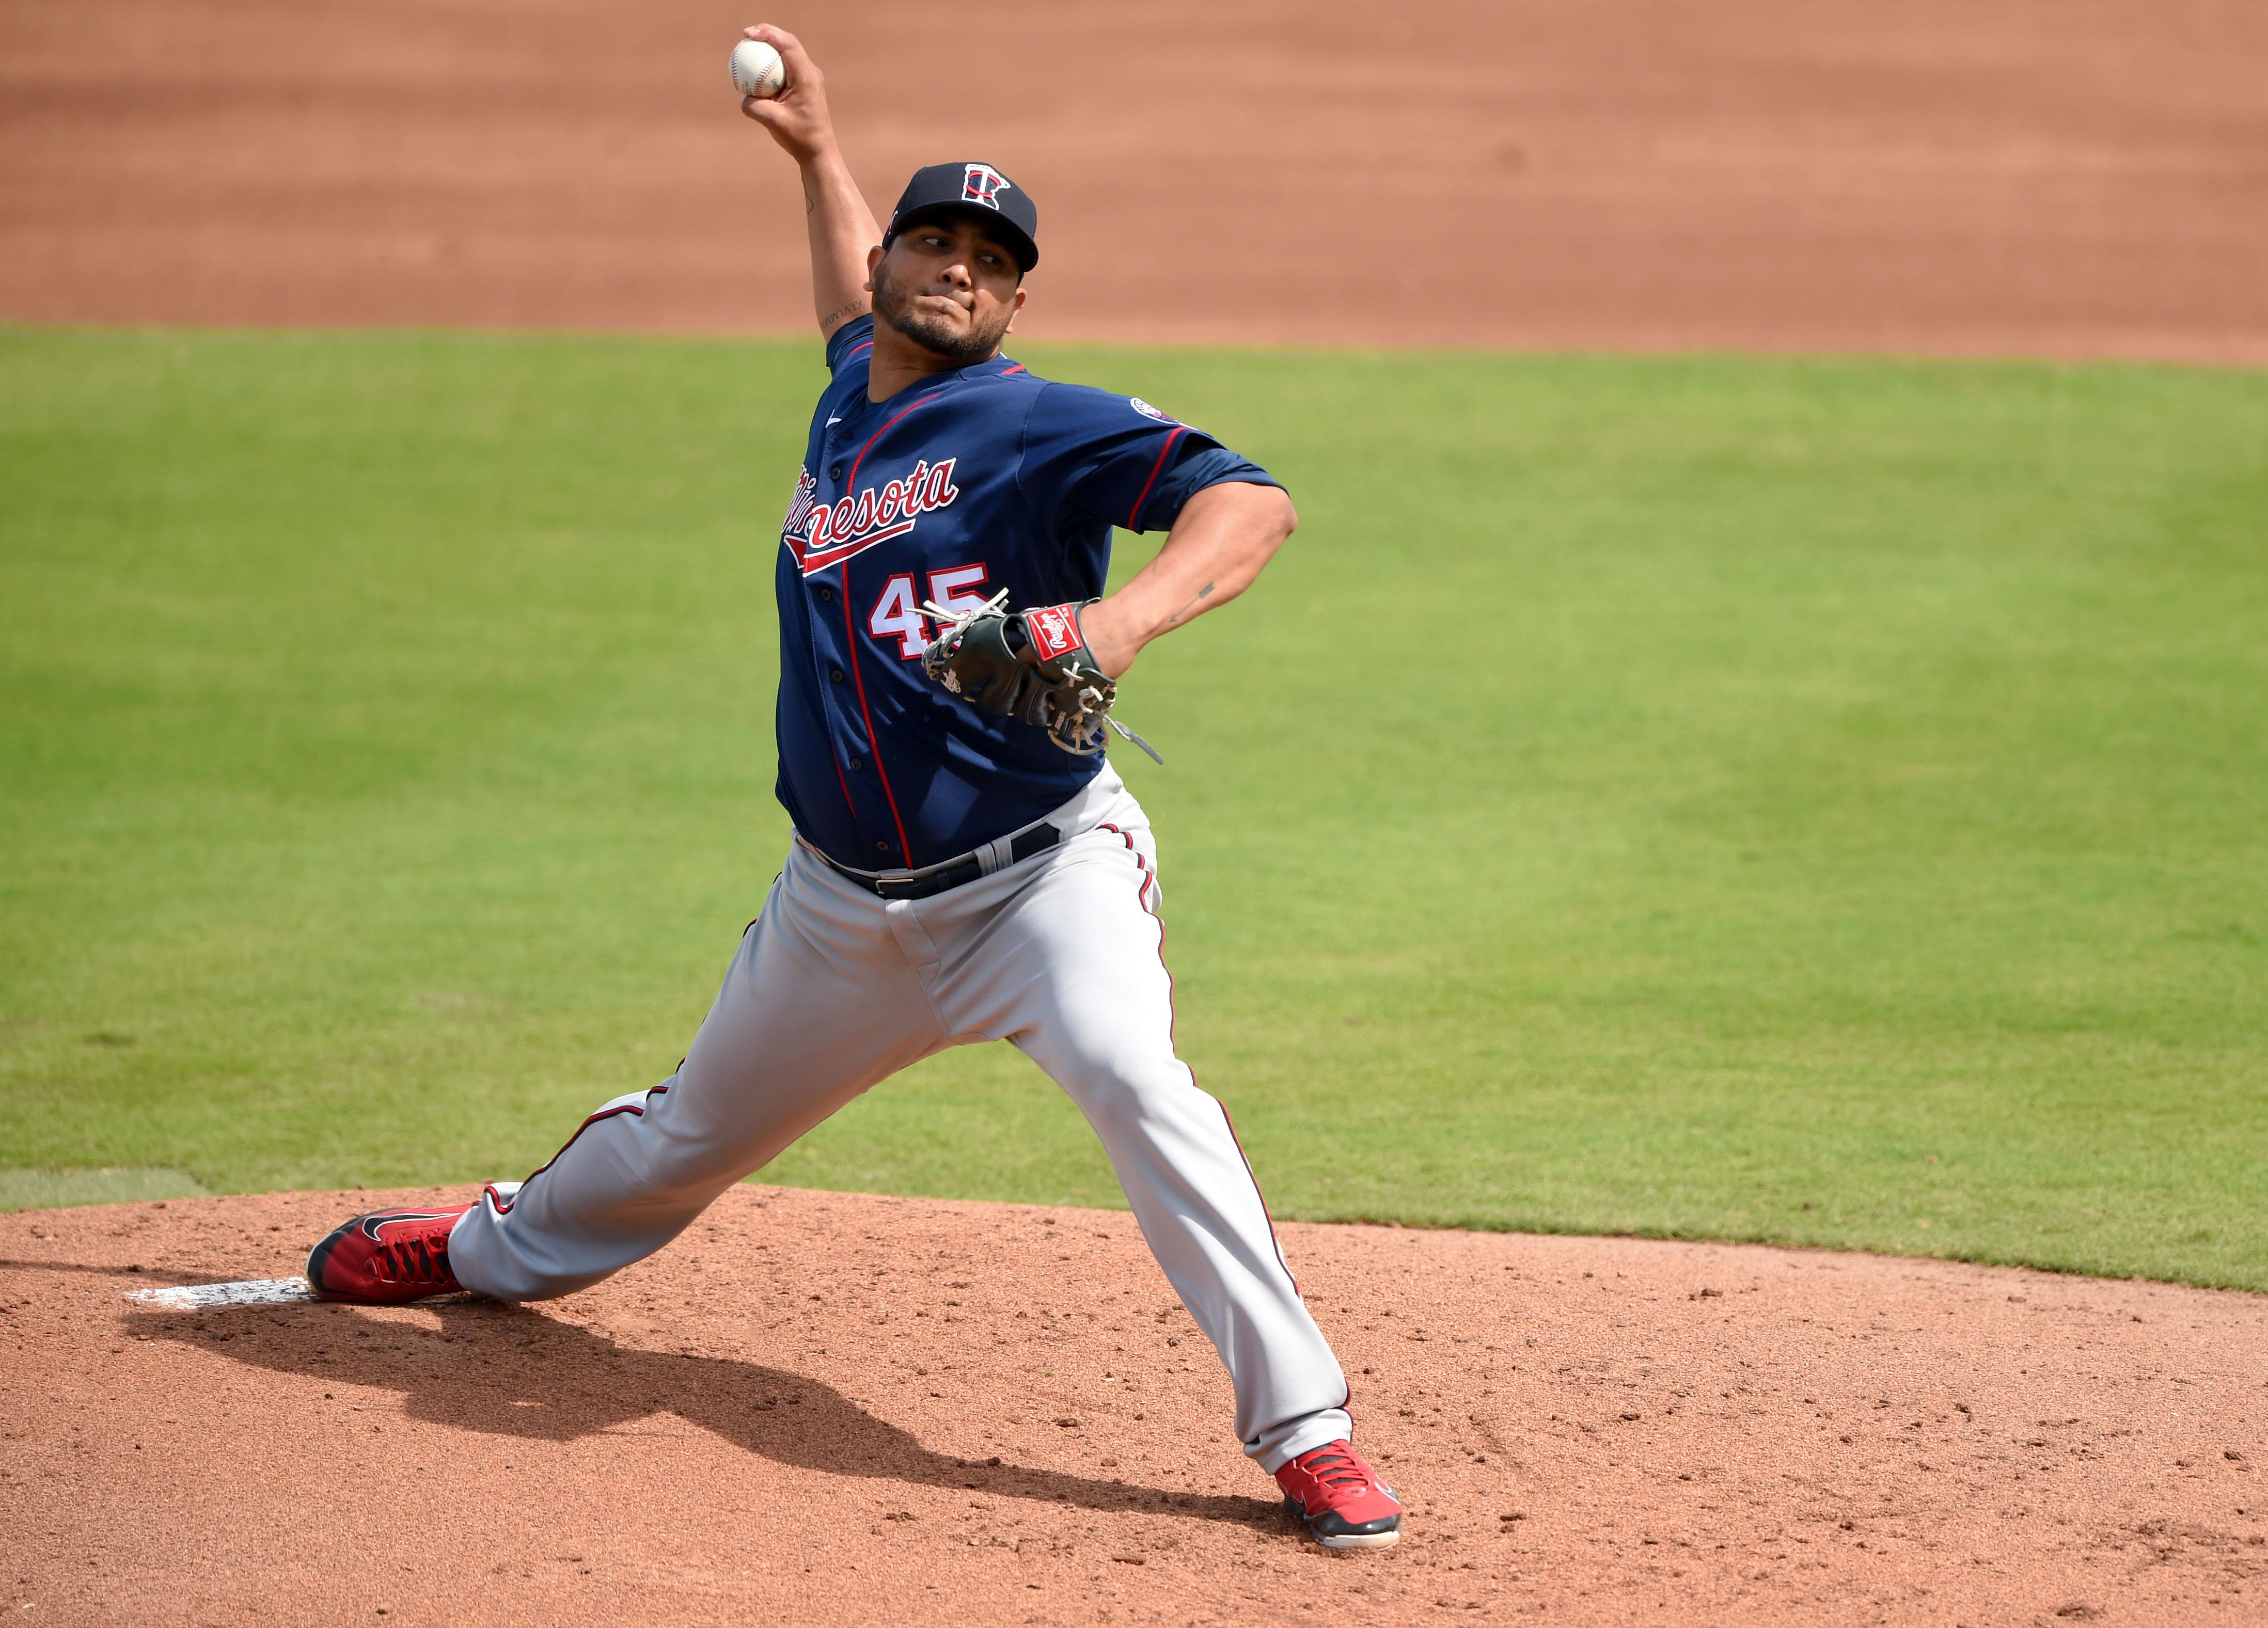 Jhoulys Chacin, New York Yankees